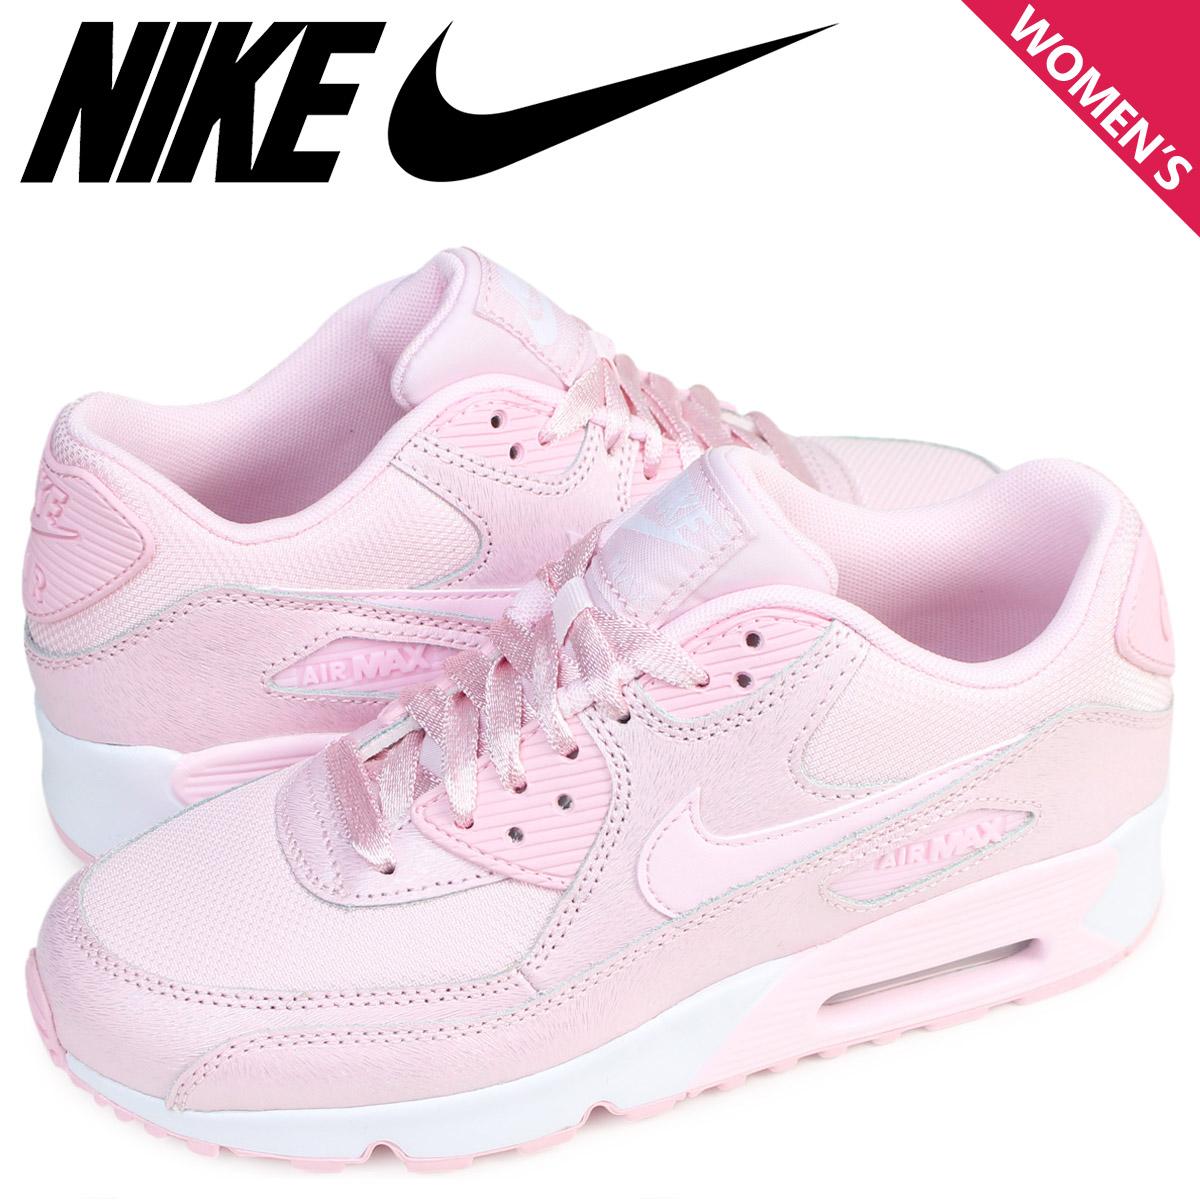 Nike NIKE Air Max 90 Lady's sneakers AIR MAX 90 SE MESH GS 880,305 600 pink